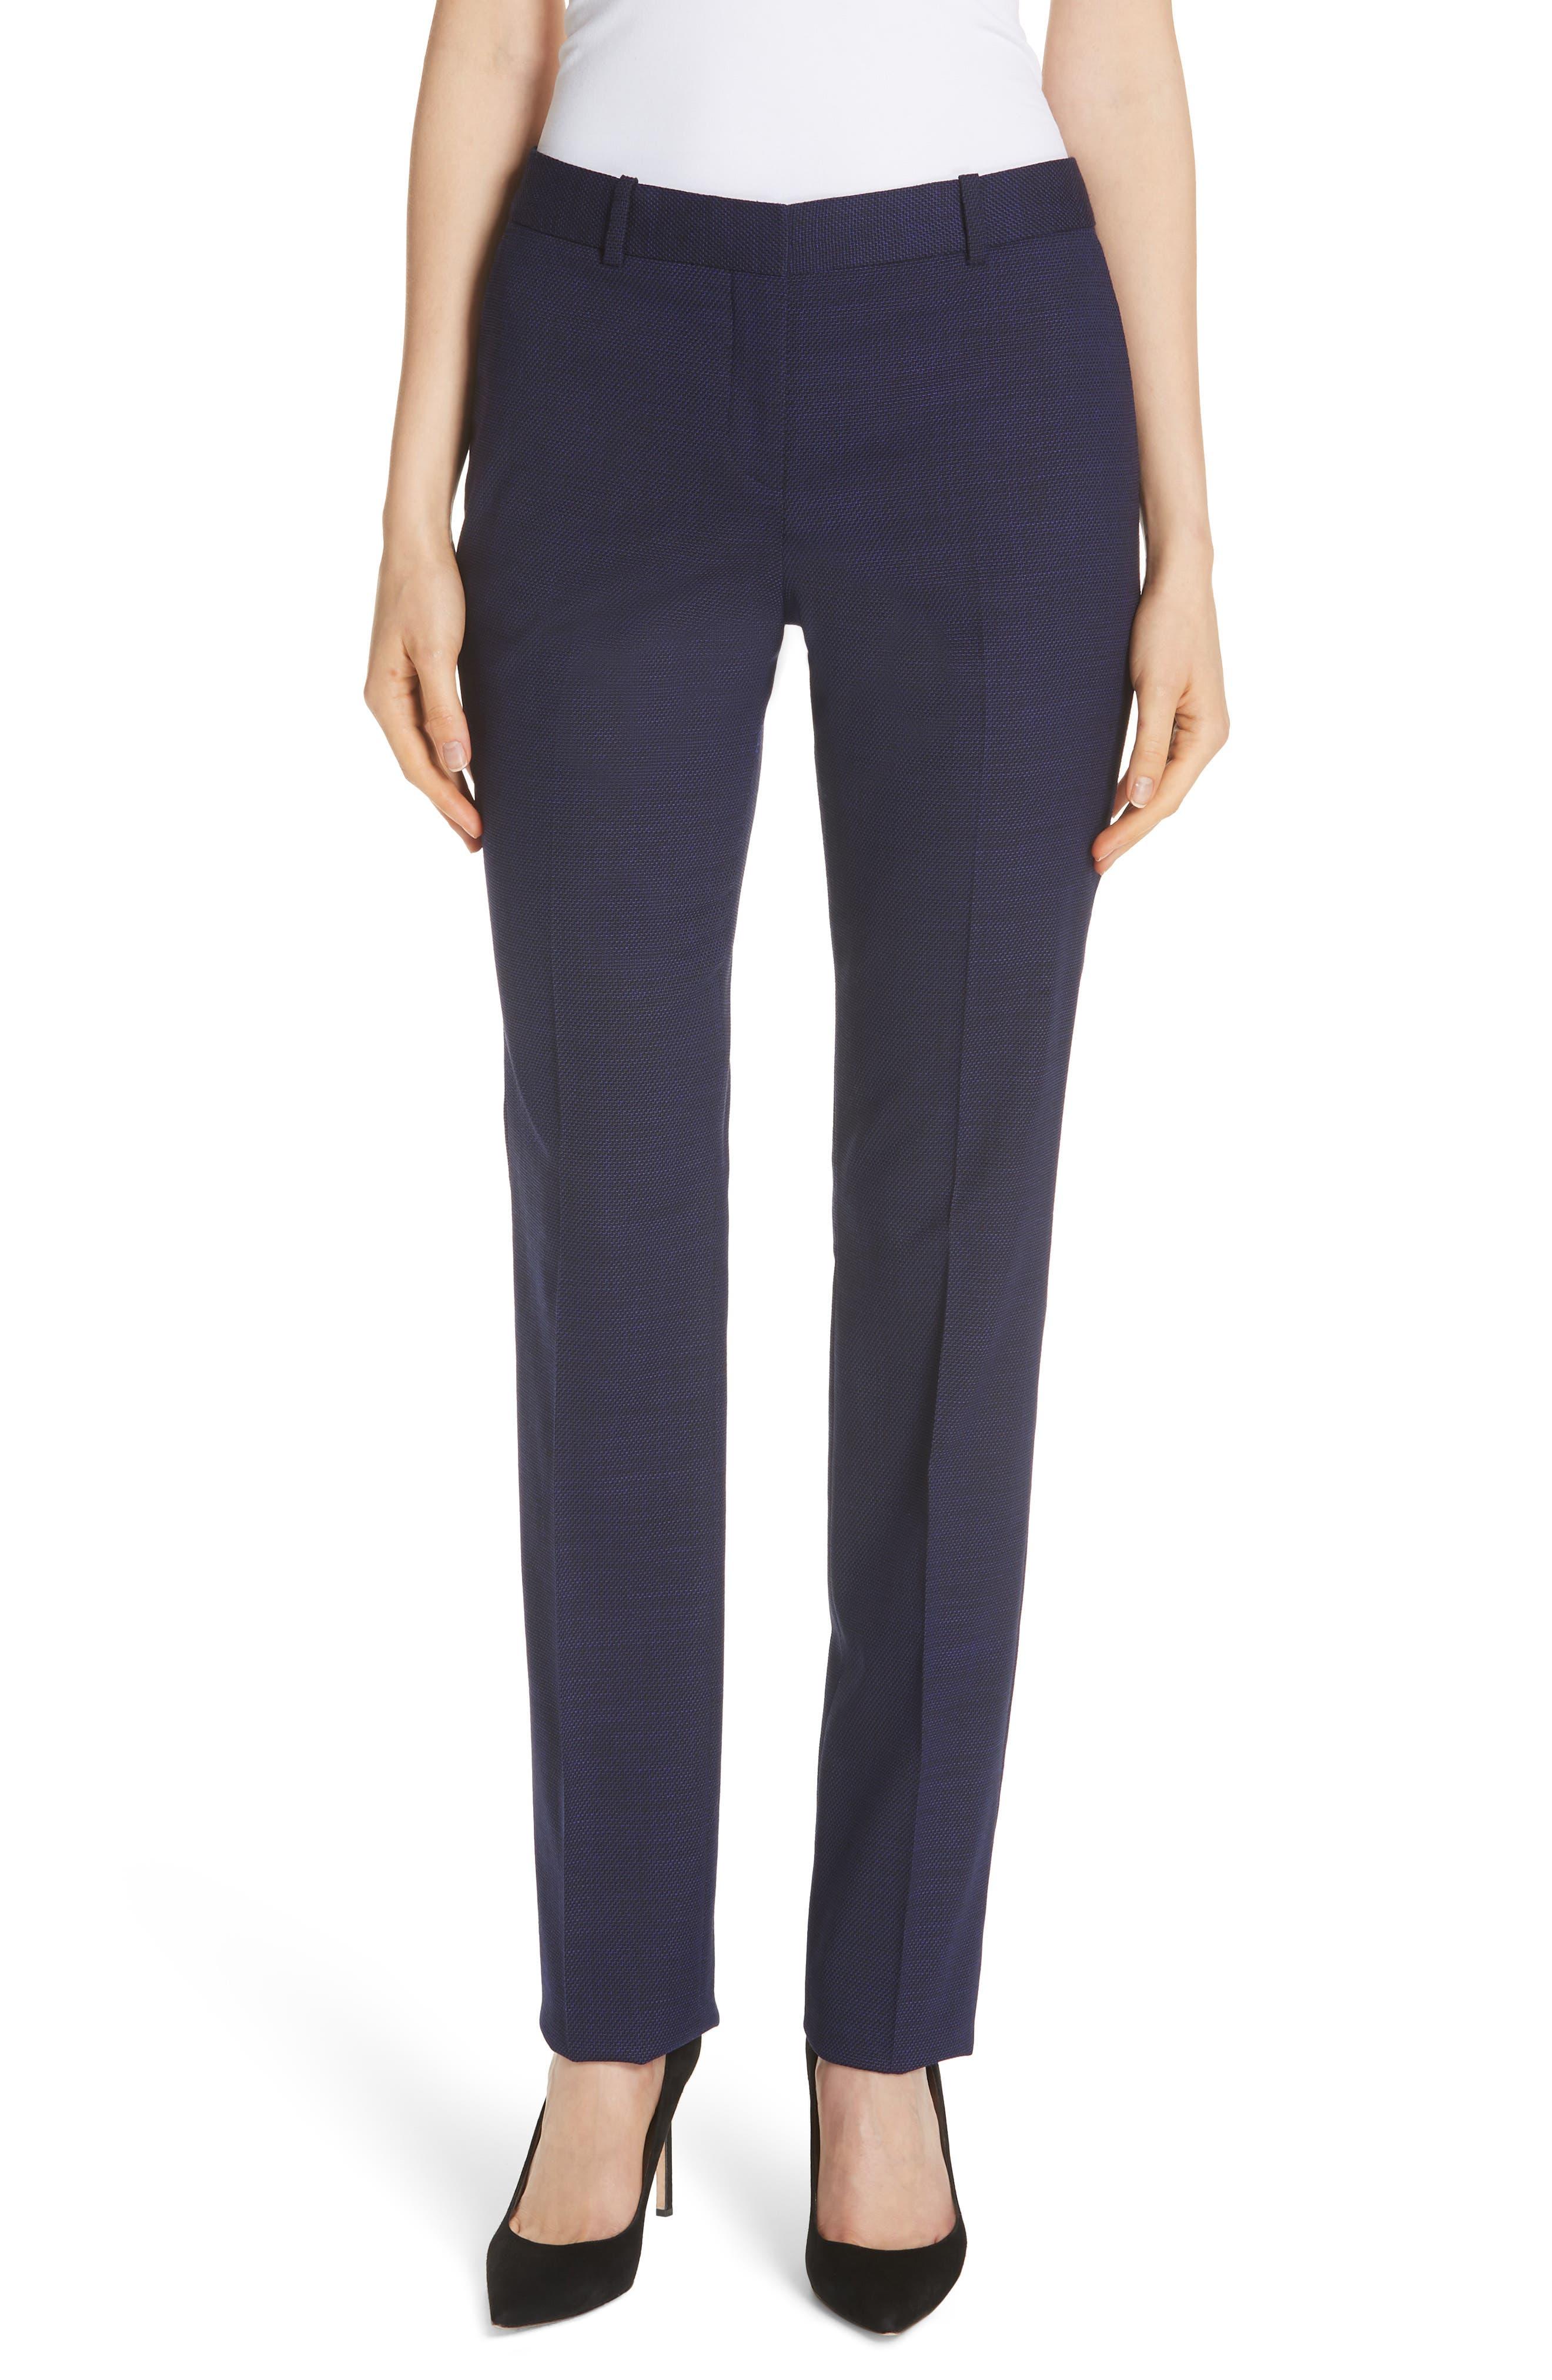 Titana Mini Glencheck Straight Leg Suit Pants,                             Main thumbnail 1, color,                             Deep Lilac Fantasy